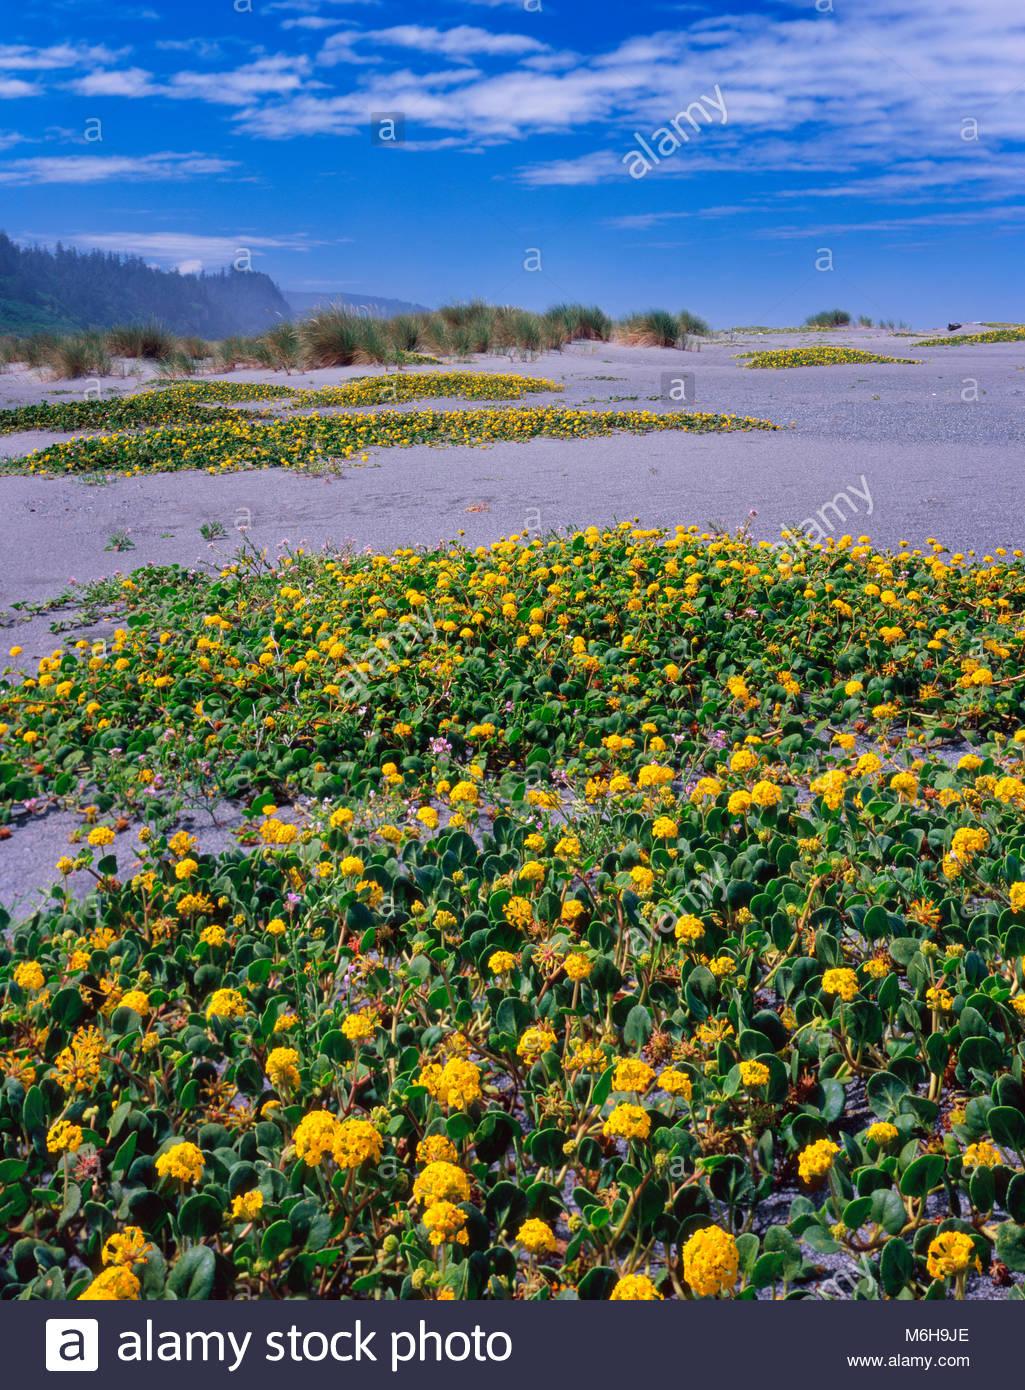 Yellow Sand Verbena, Gold Bluffs Beach, Prairie Creek Redwoods State Park, Redwood National Park, California - Stock Image